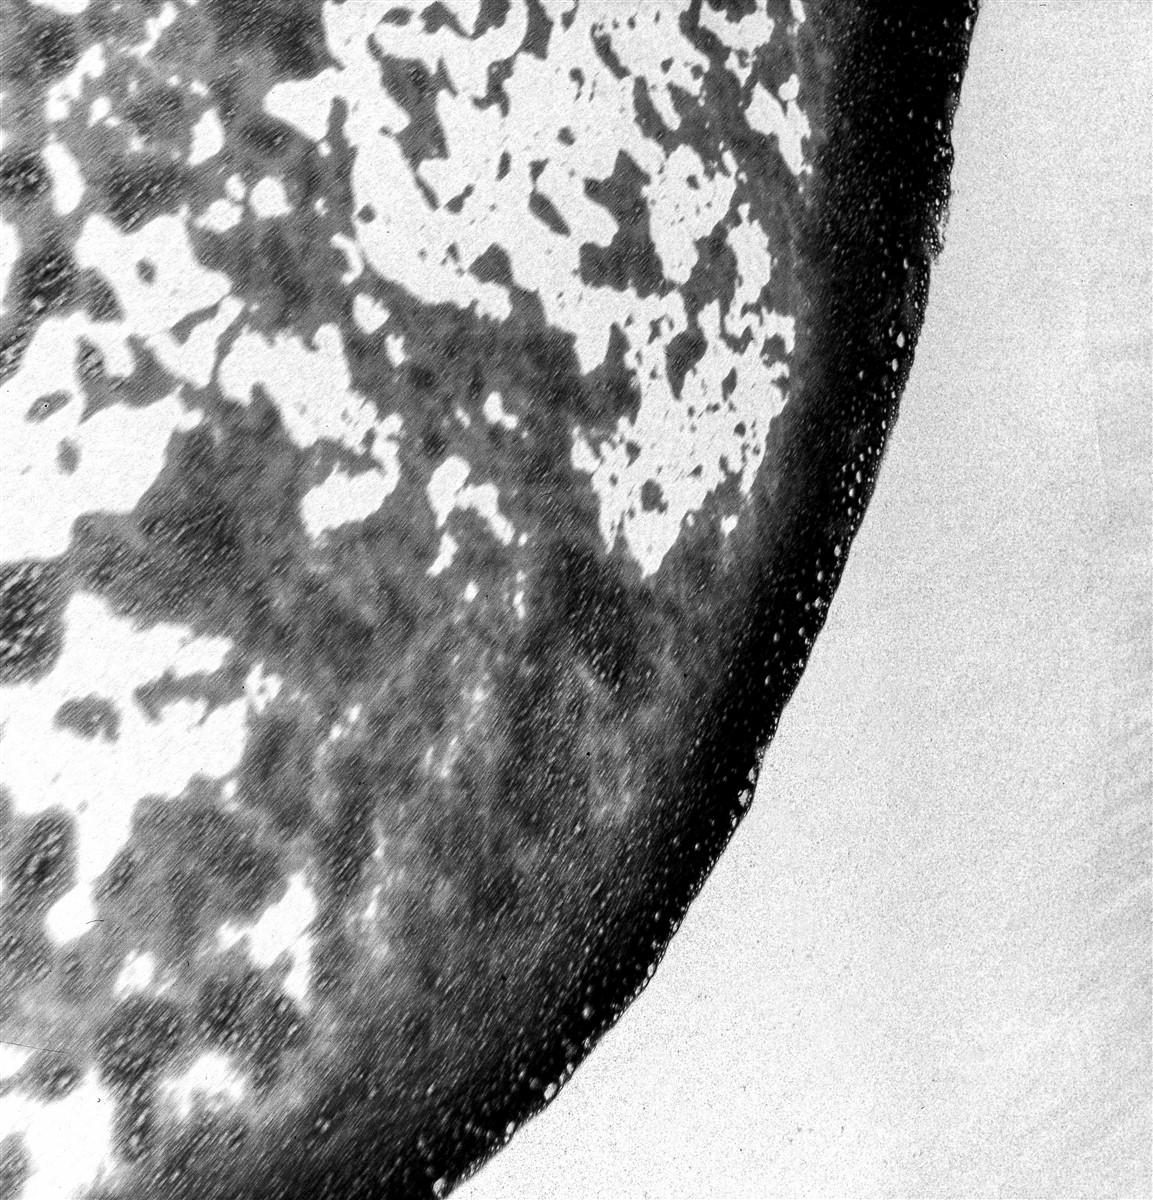 Riccardo Squillantini, Circumnavigating Mars Planet, Martian Age series